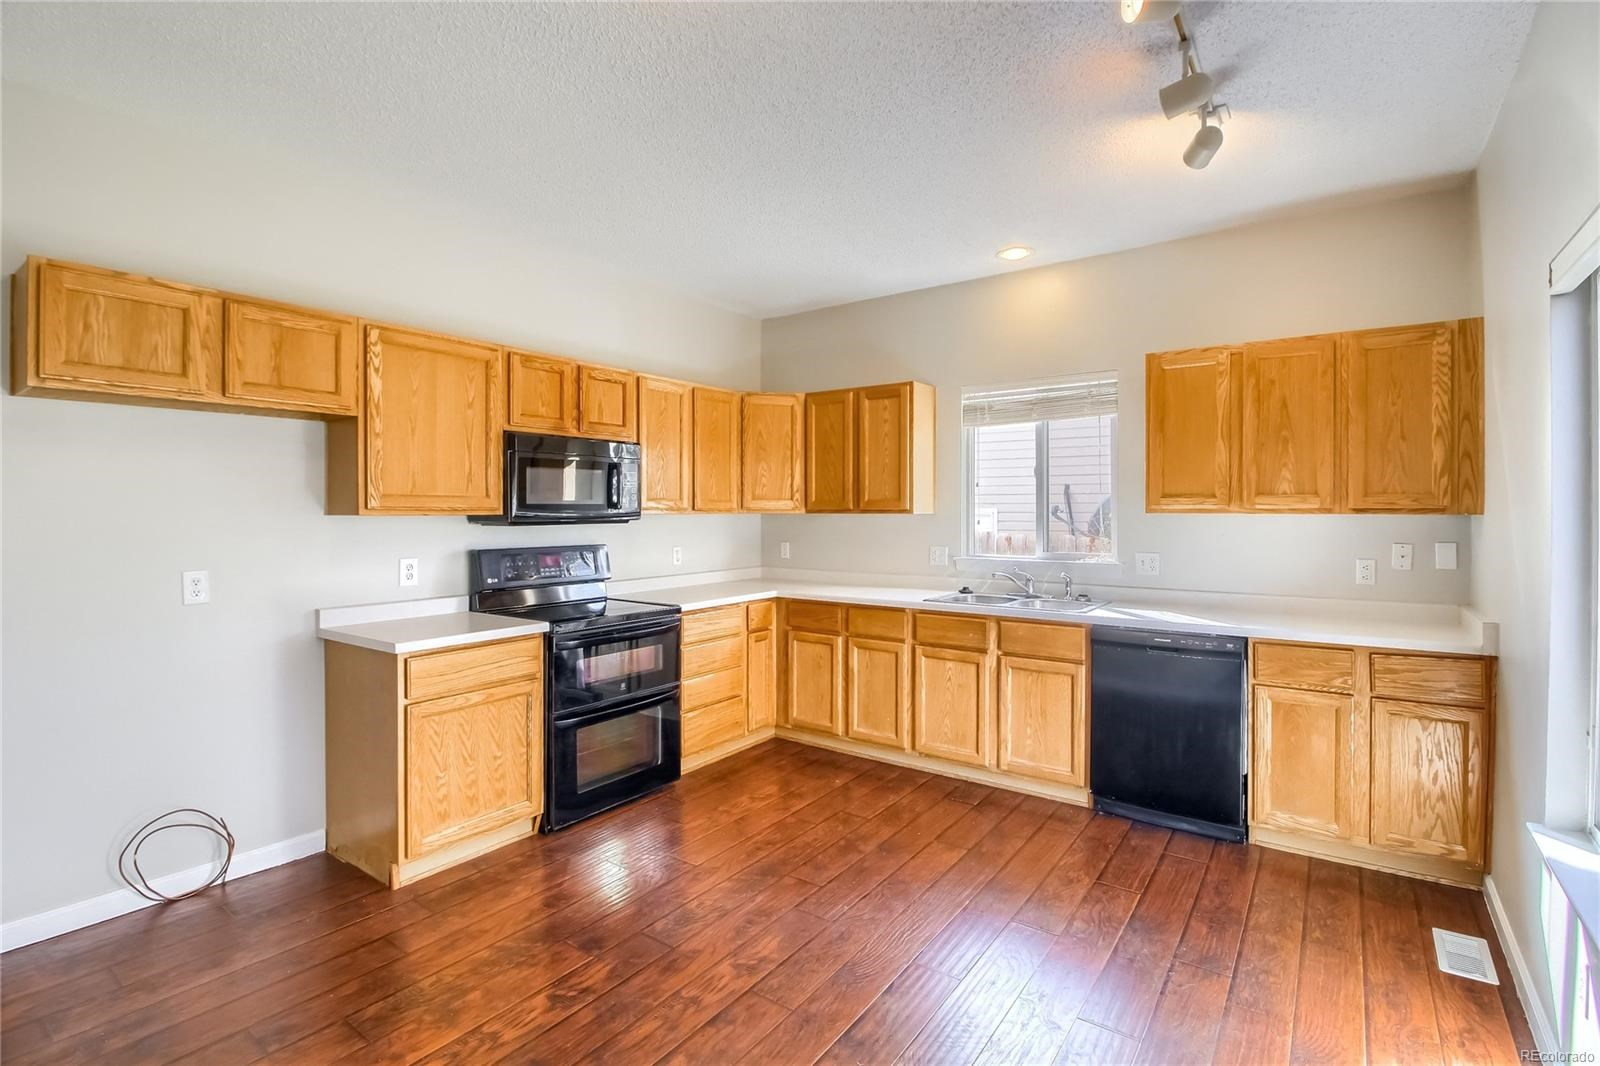 MLS# 4174025 - 1 - 19385  E Hampden Place, Aurora, CO 80013